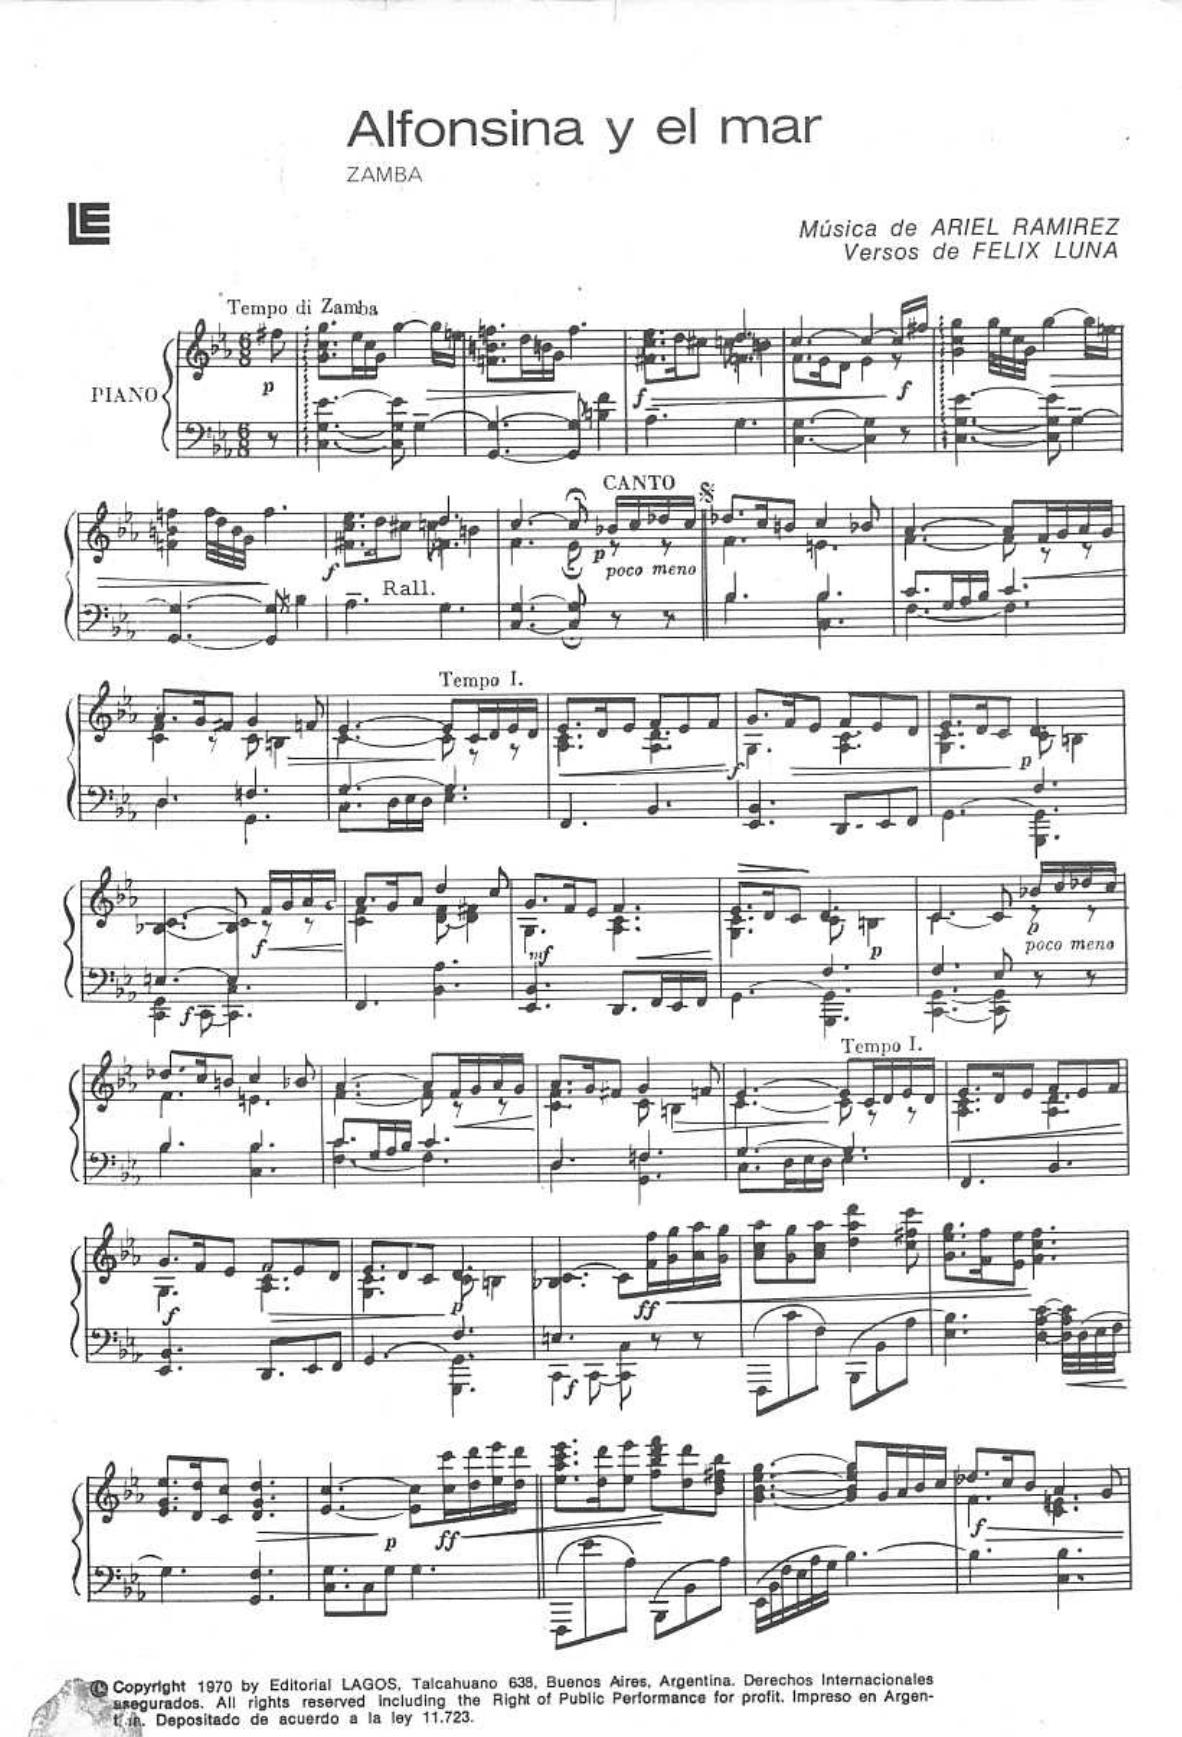 ALFONSINA Y EL MAR SHEET MUSIC PDF